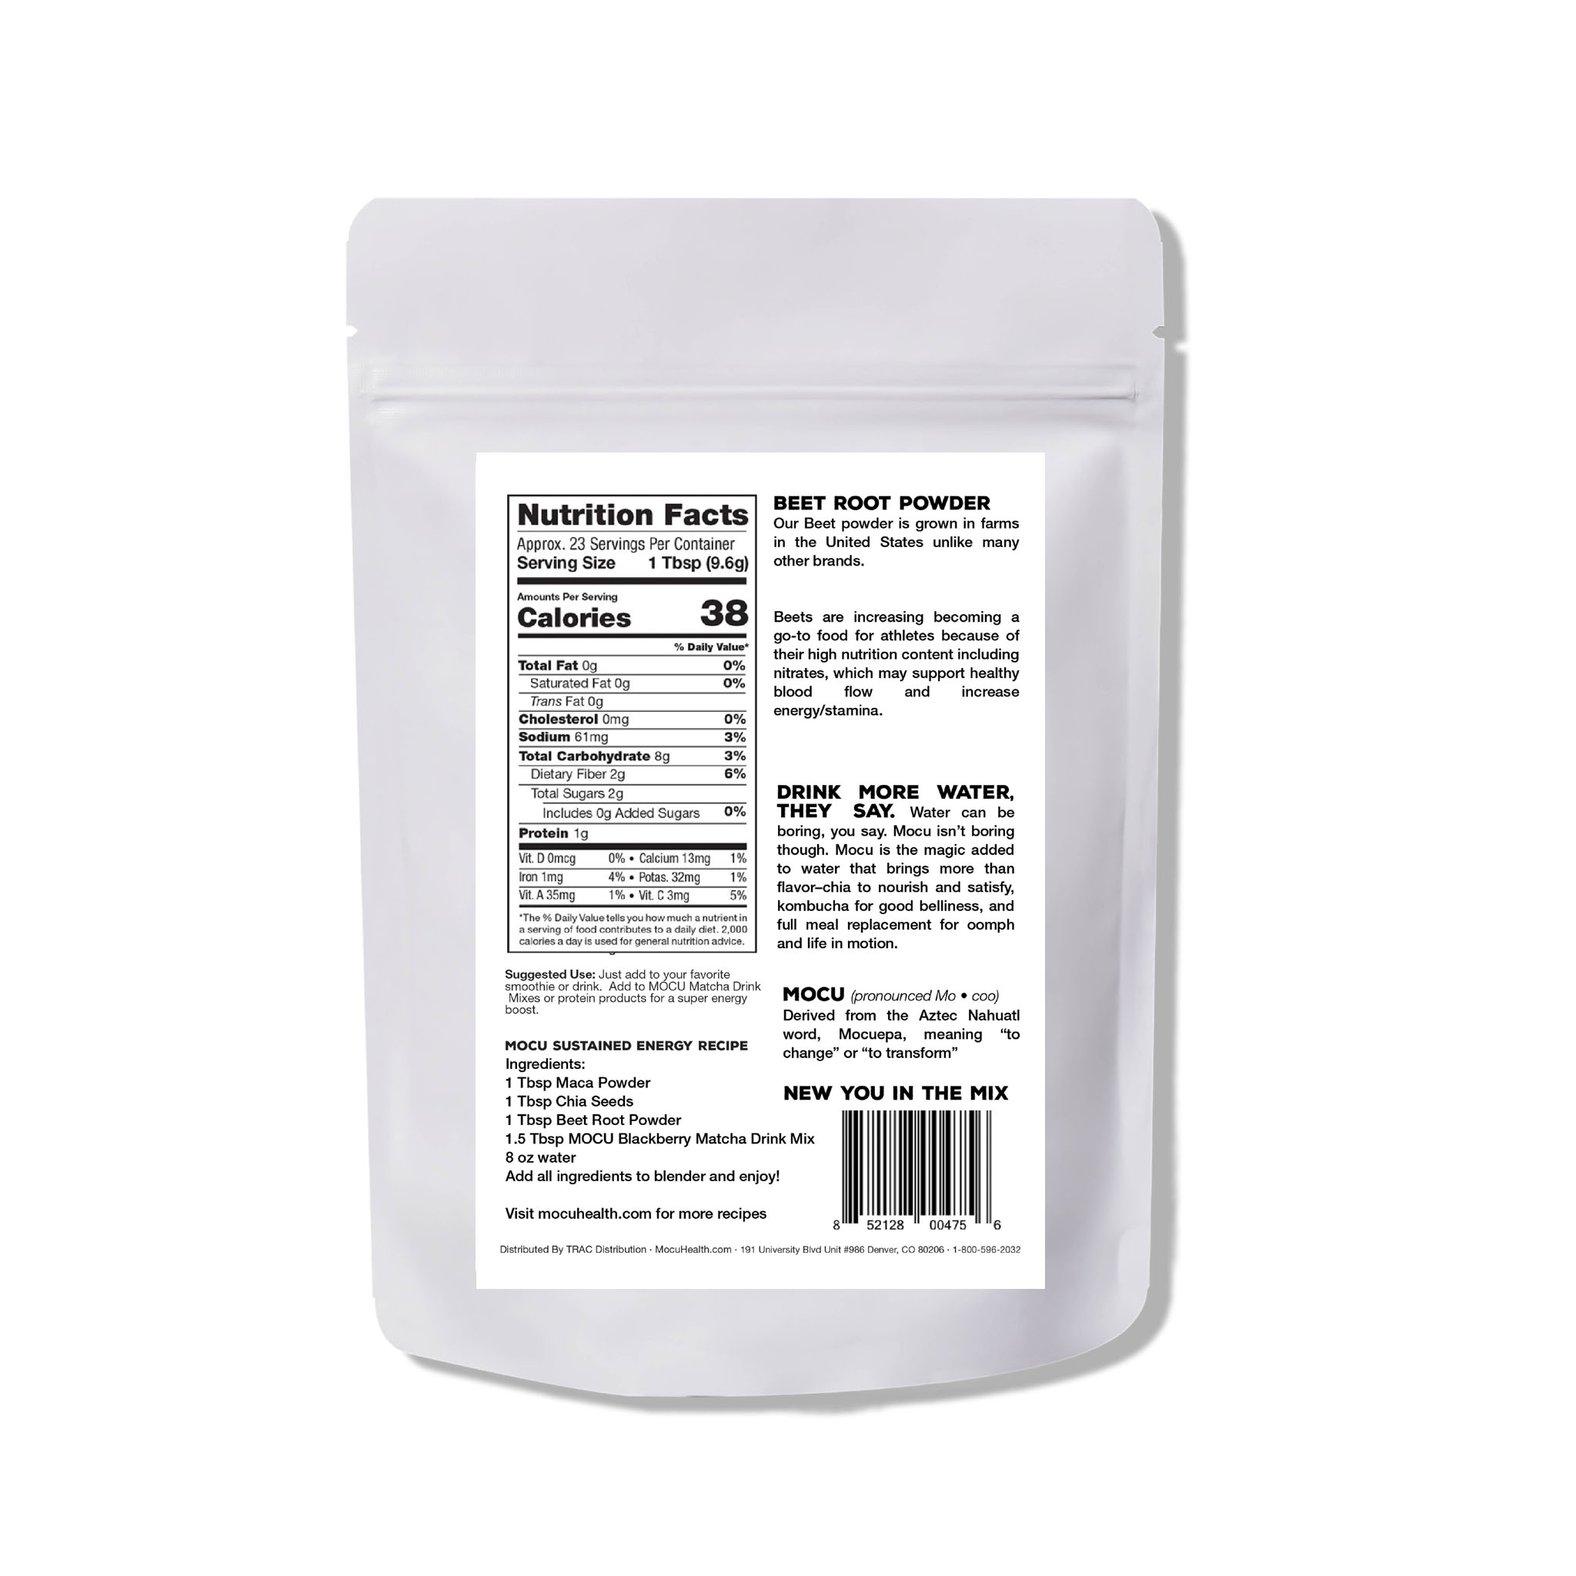 mocu-organic-beet-root-powder-back.jpg